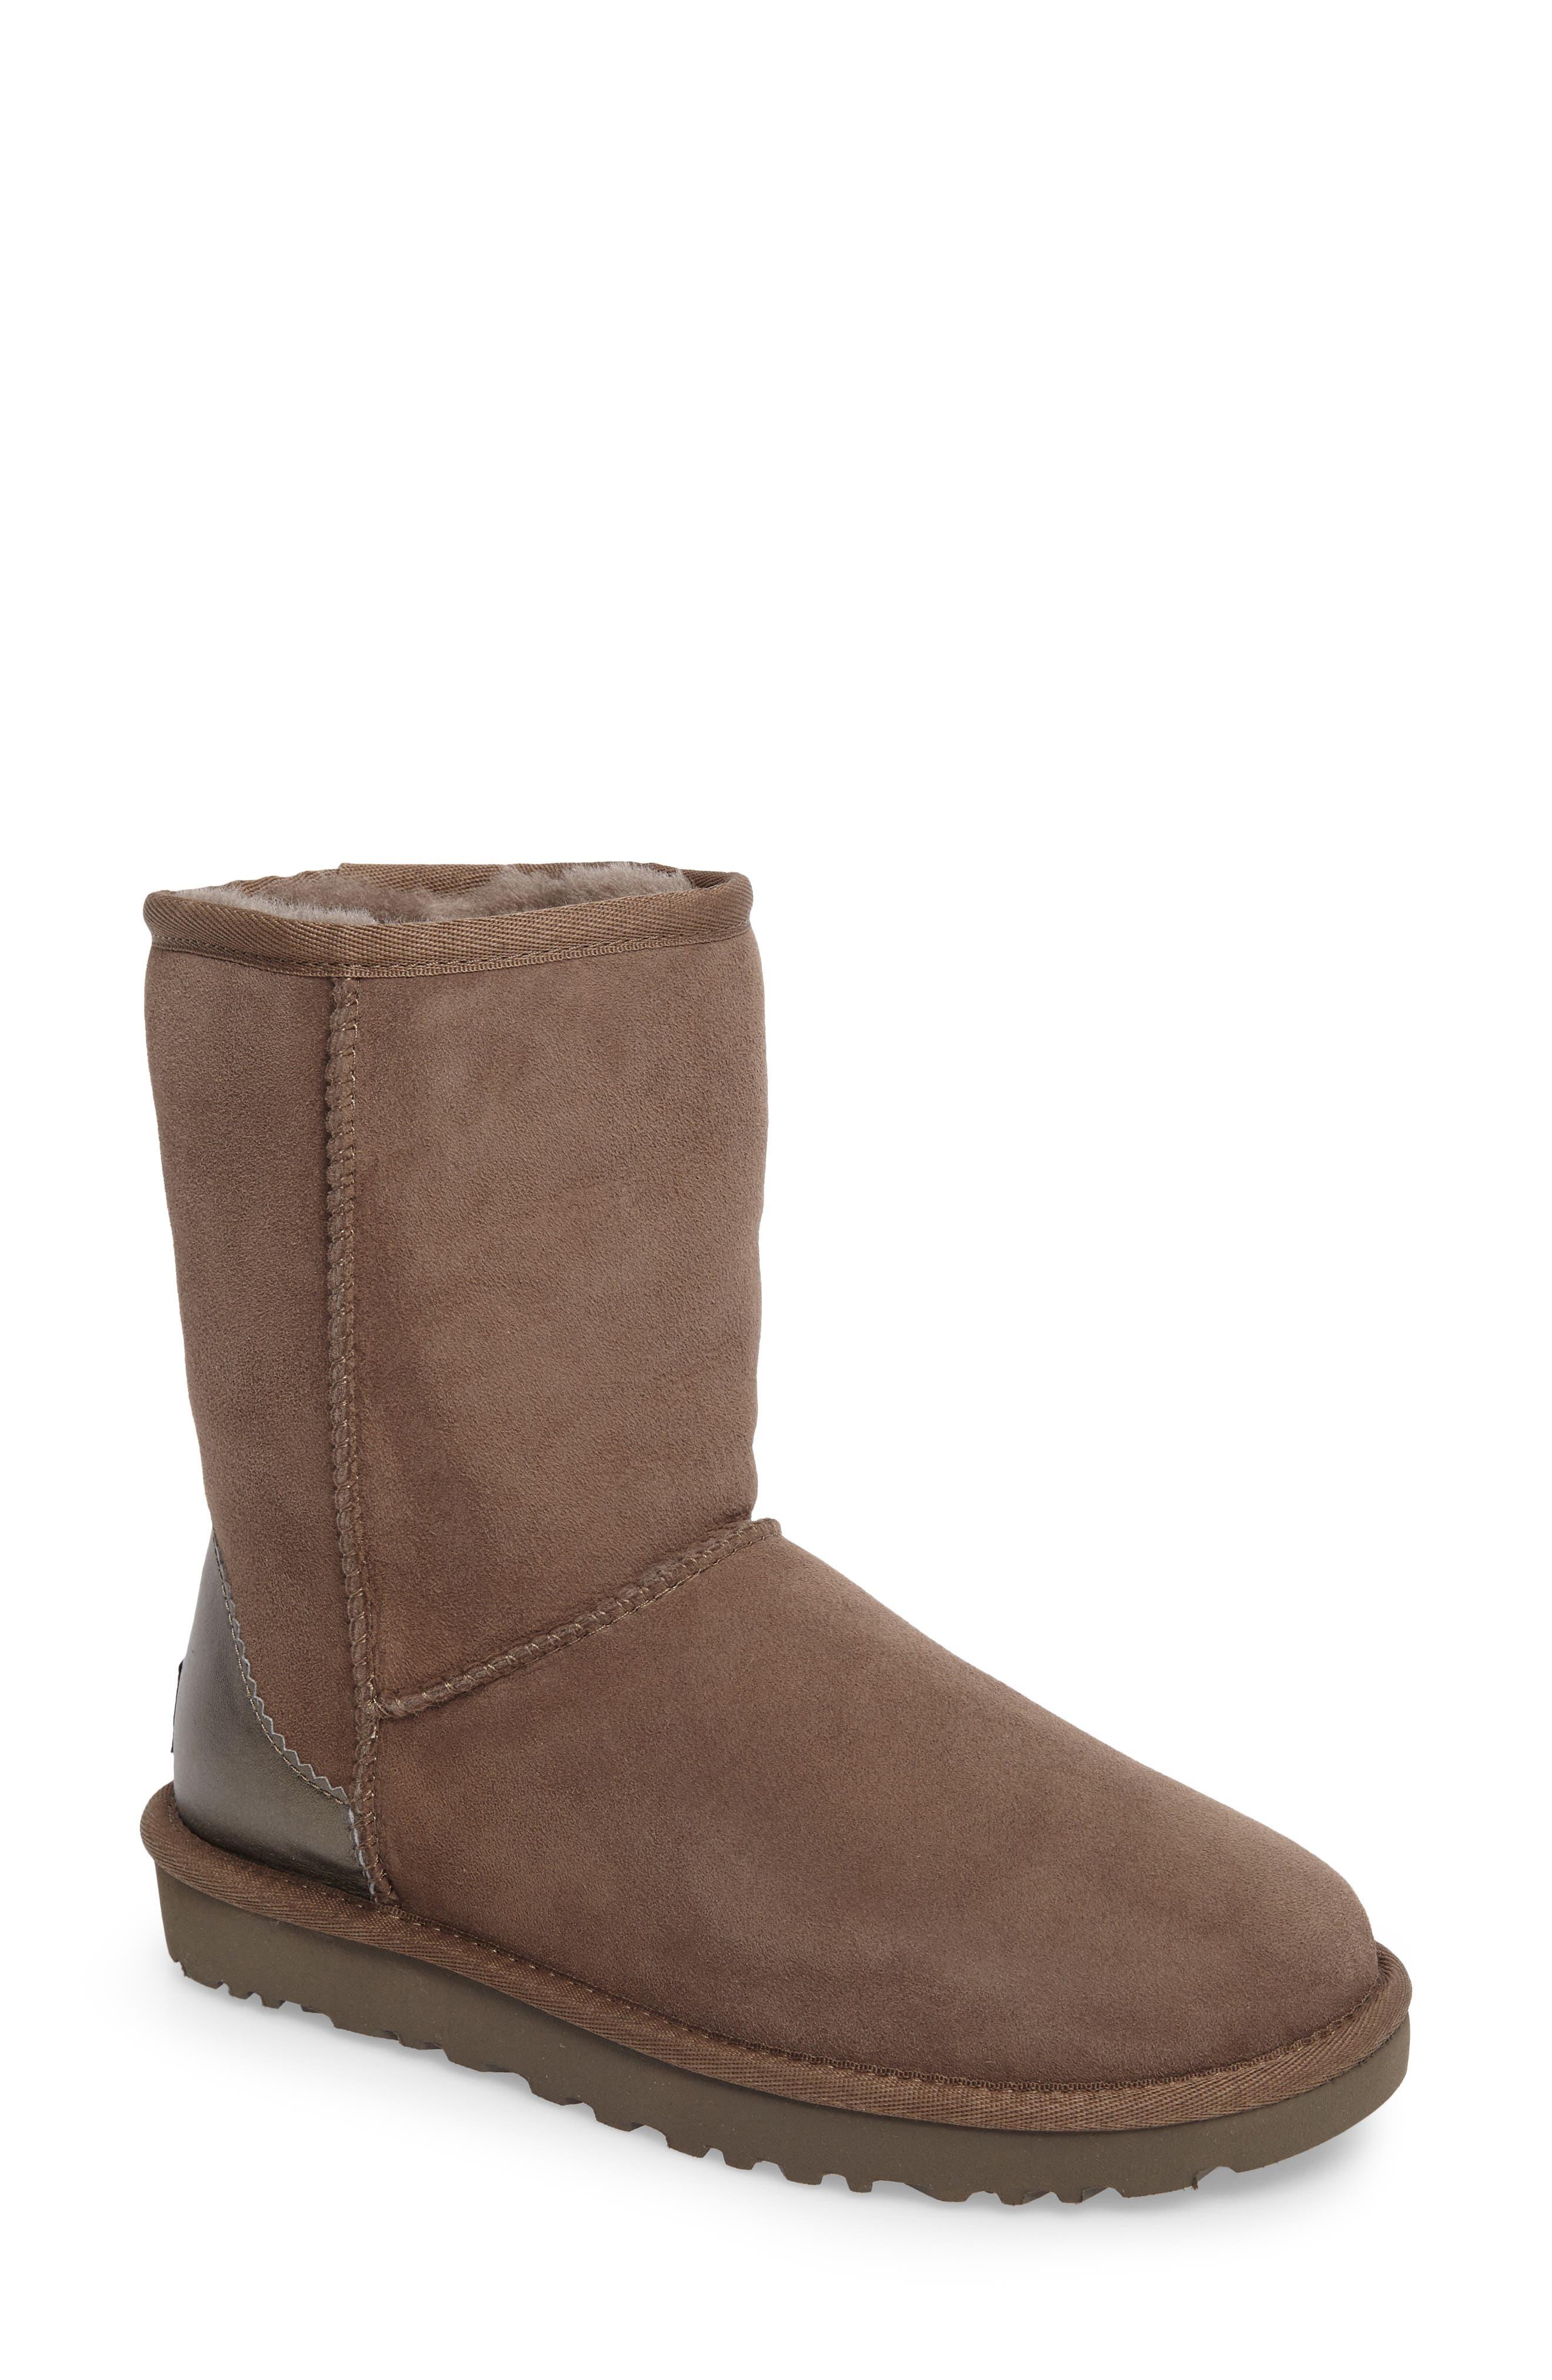 Alternate Image 1 Selected - UGG® Classic II Short Boot (Women)